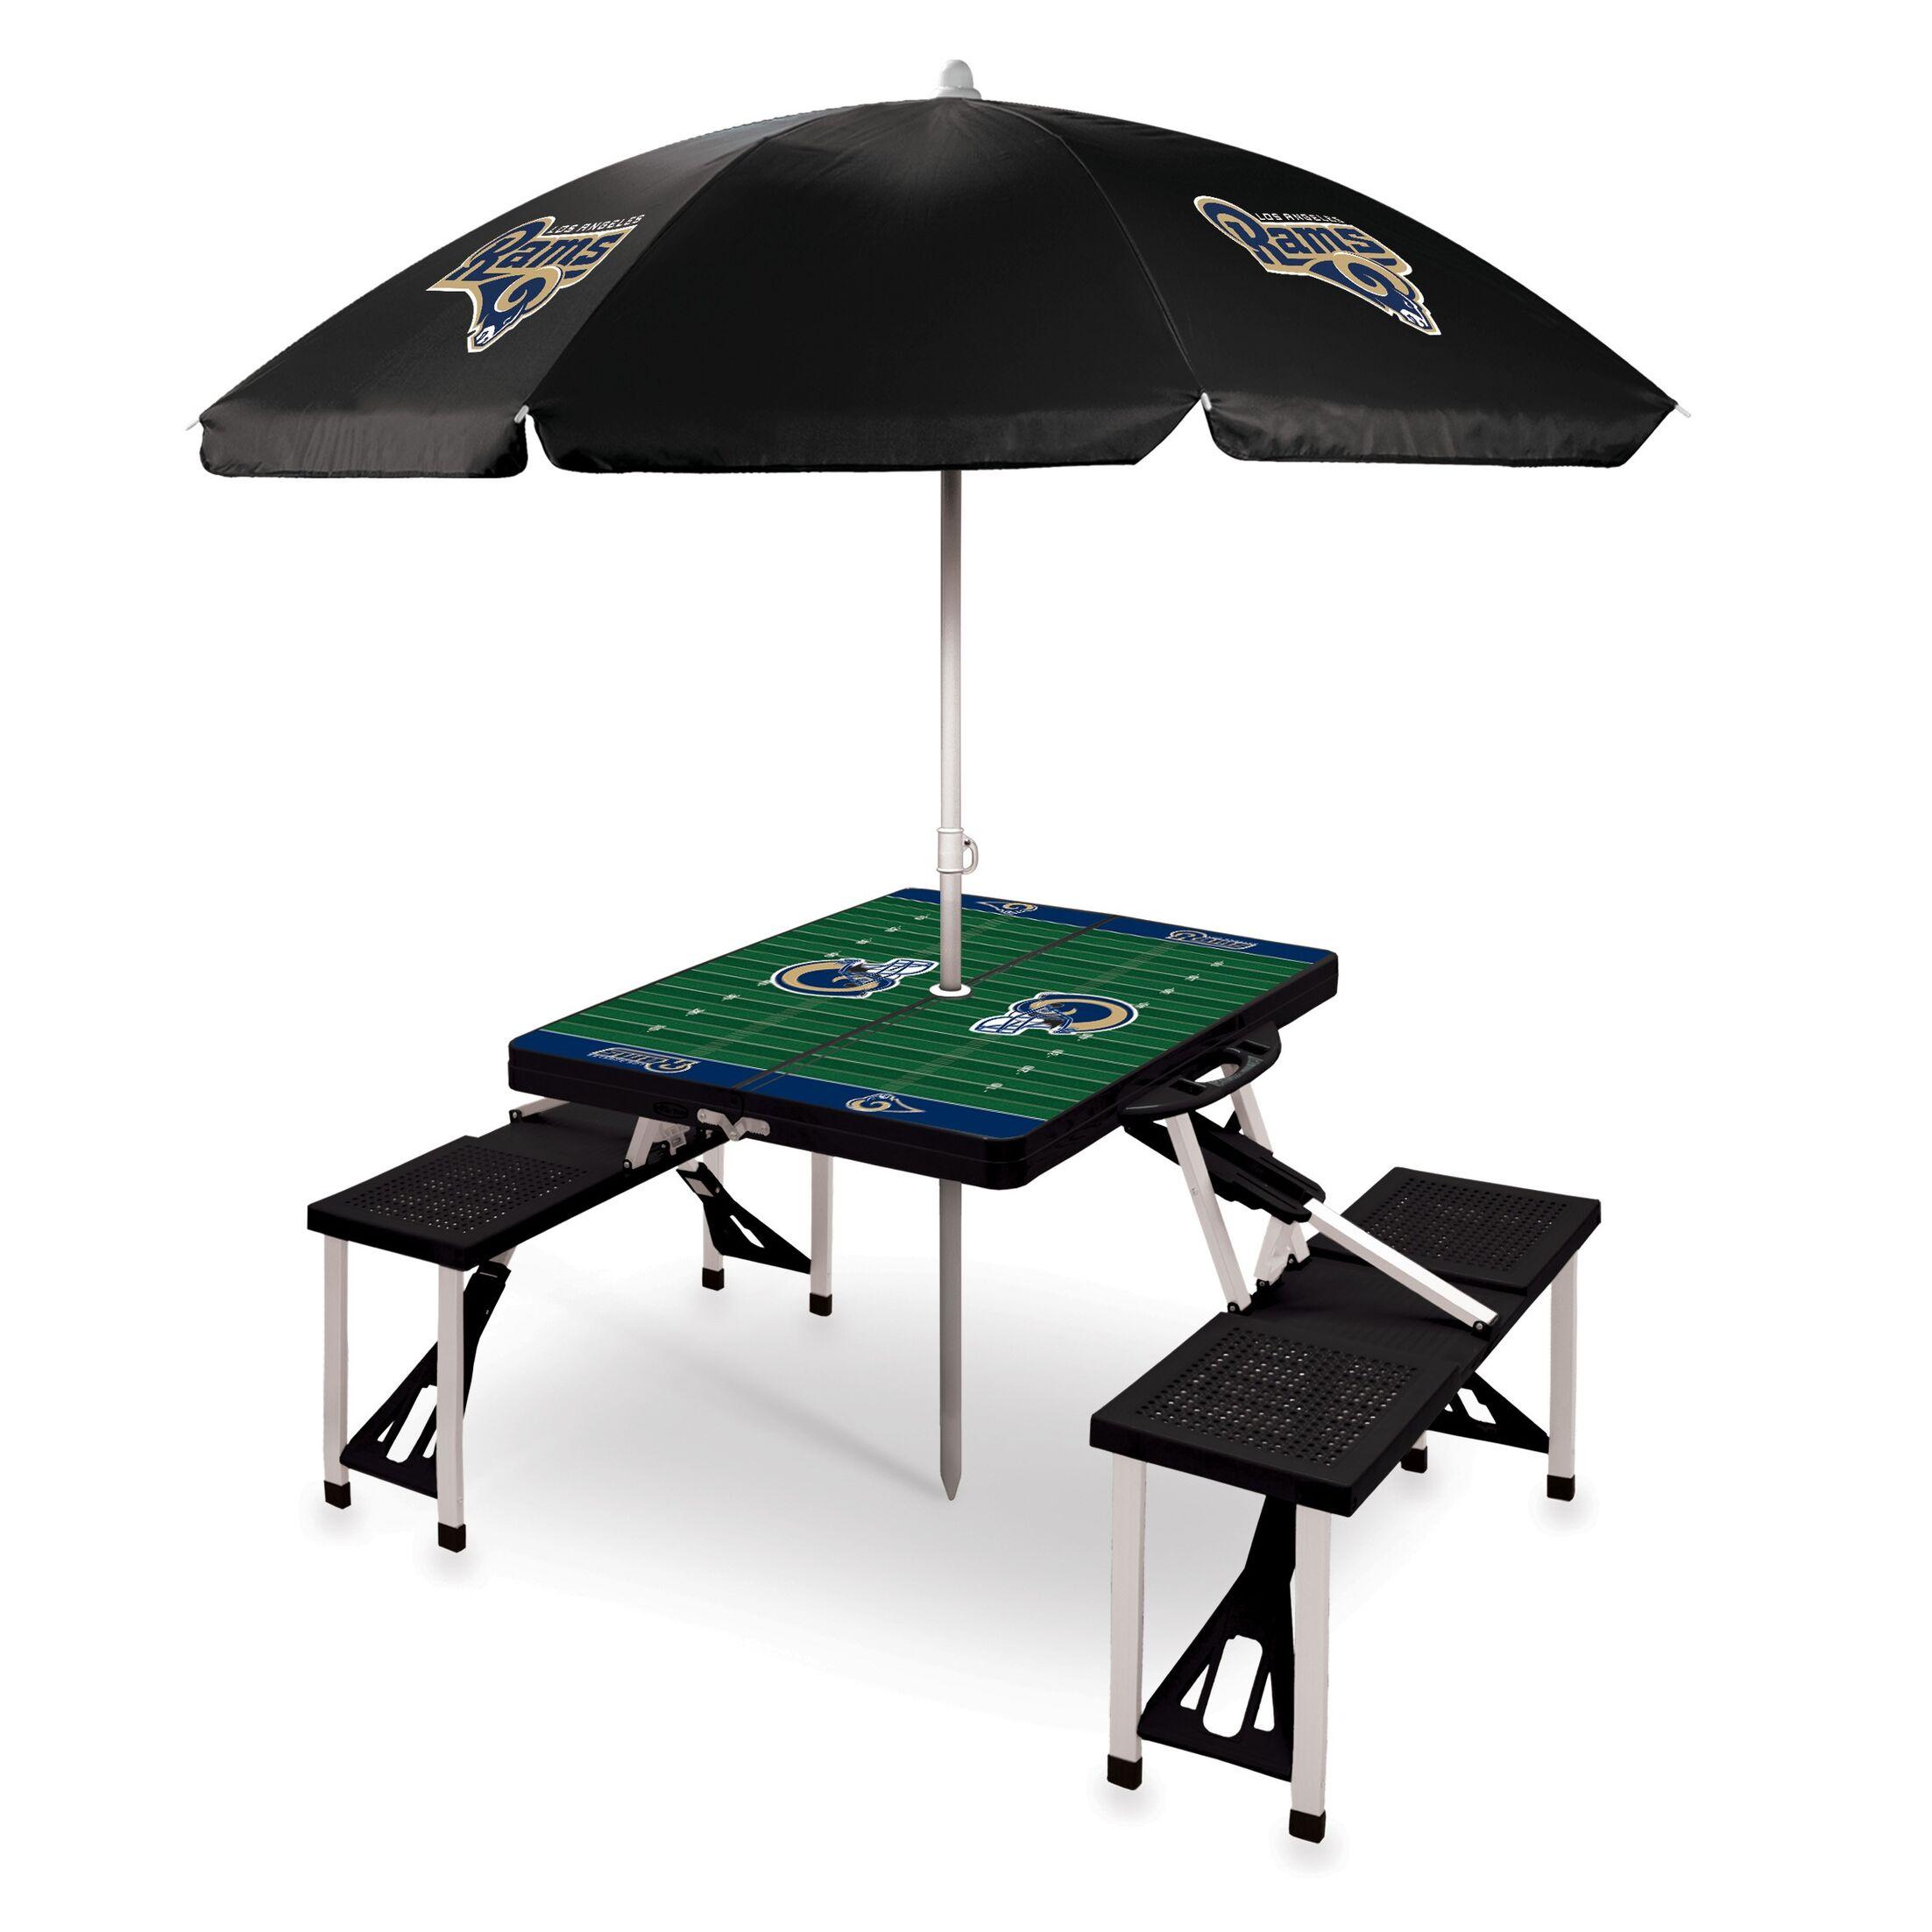 Picnic Table NFL Team: Los Angeles Rams/Black